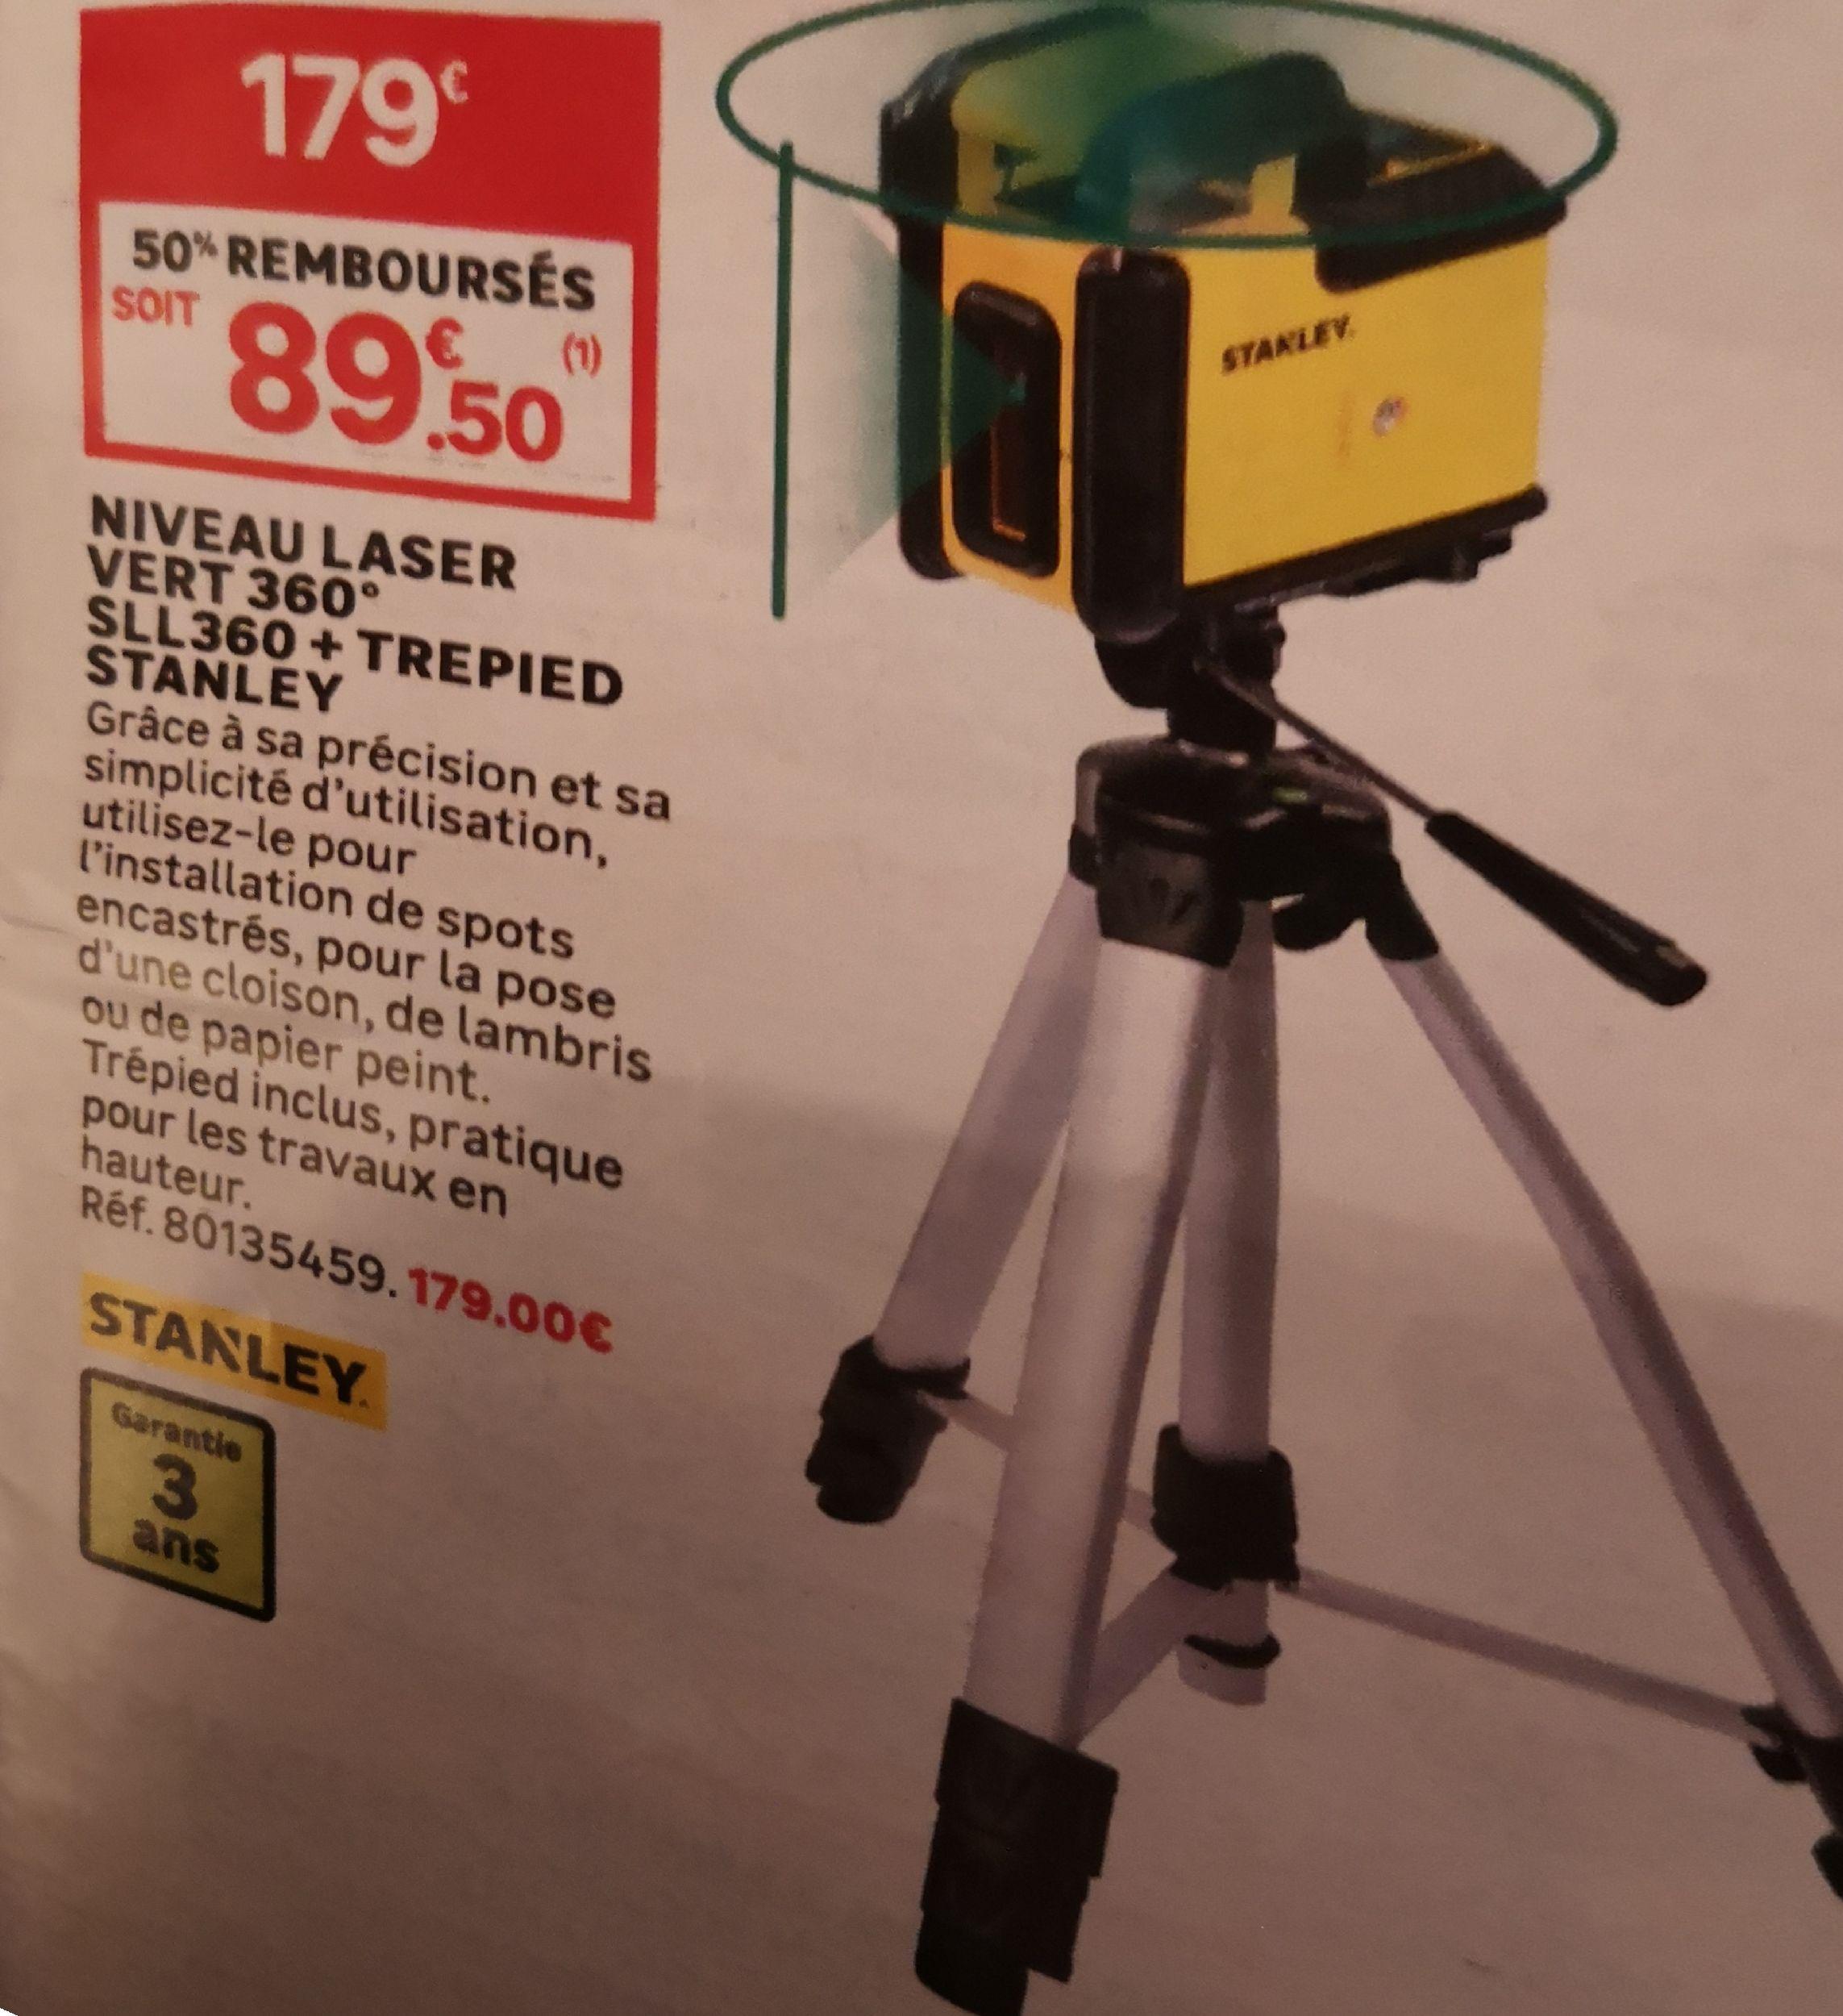 Niveau laser 360° Stanley Sll360 avec trépied (via ODR 50%)